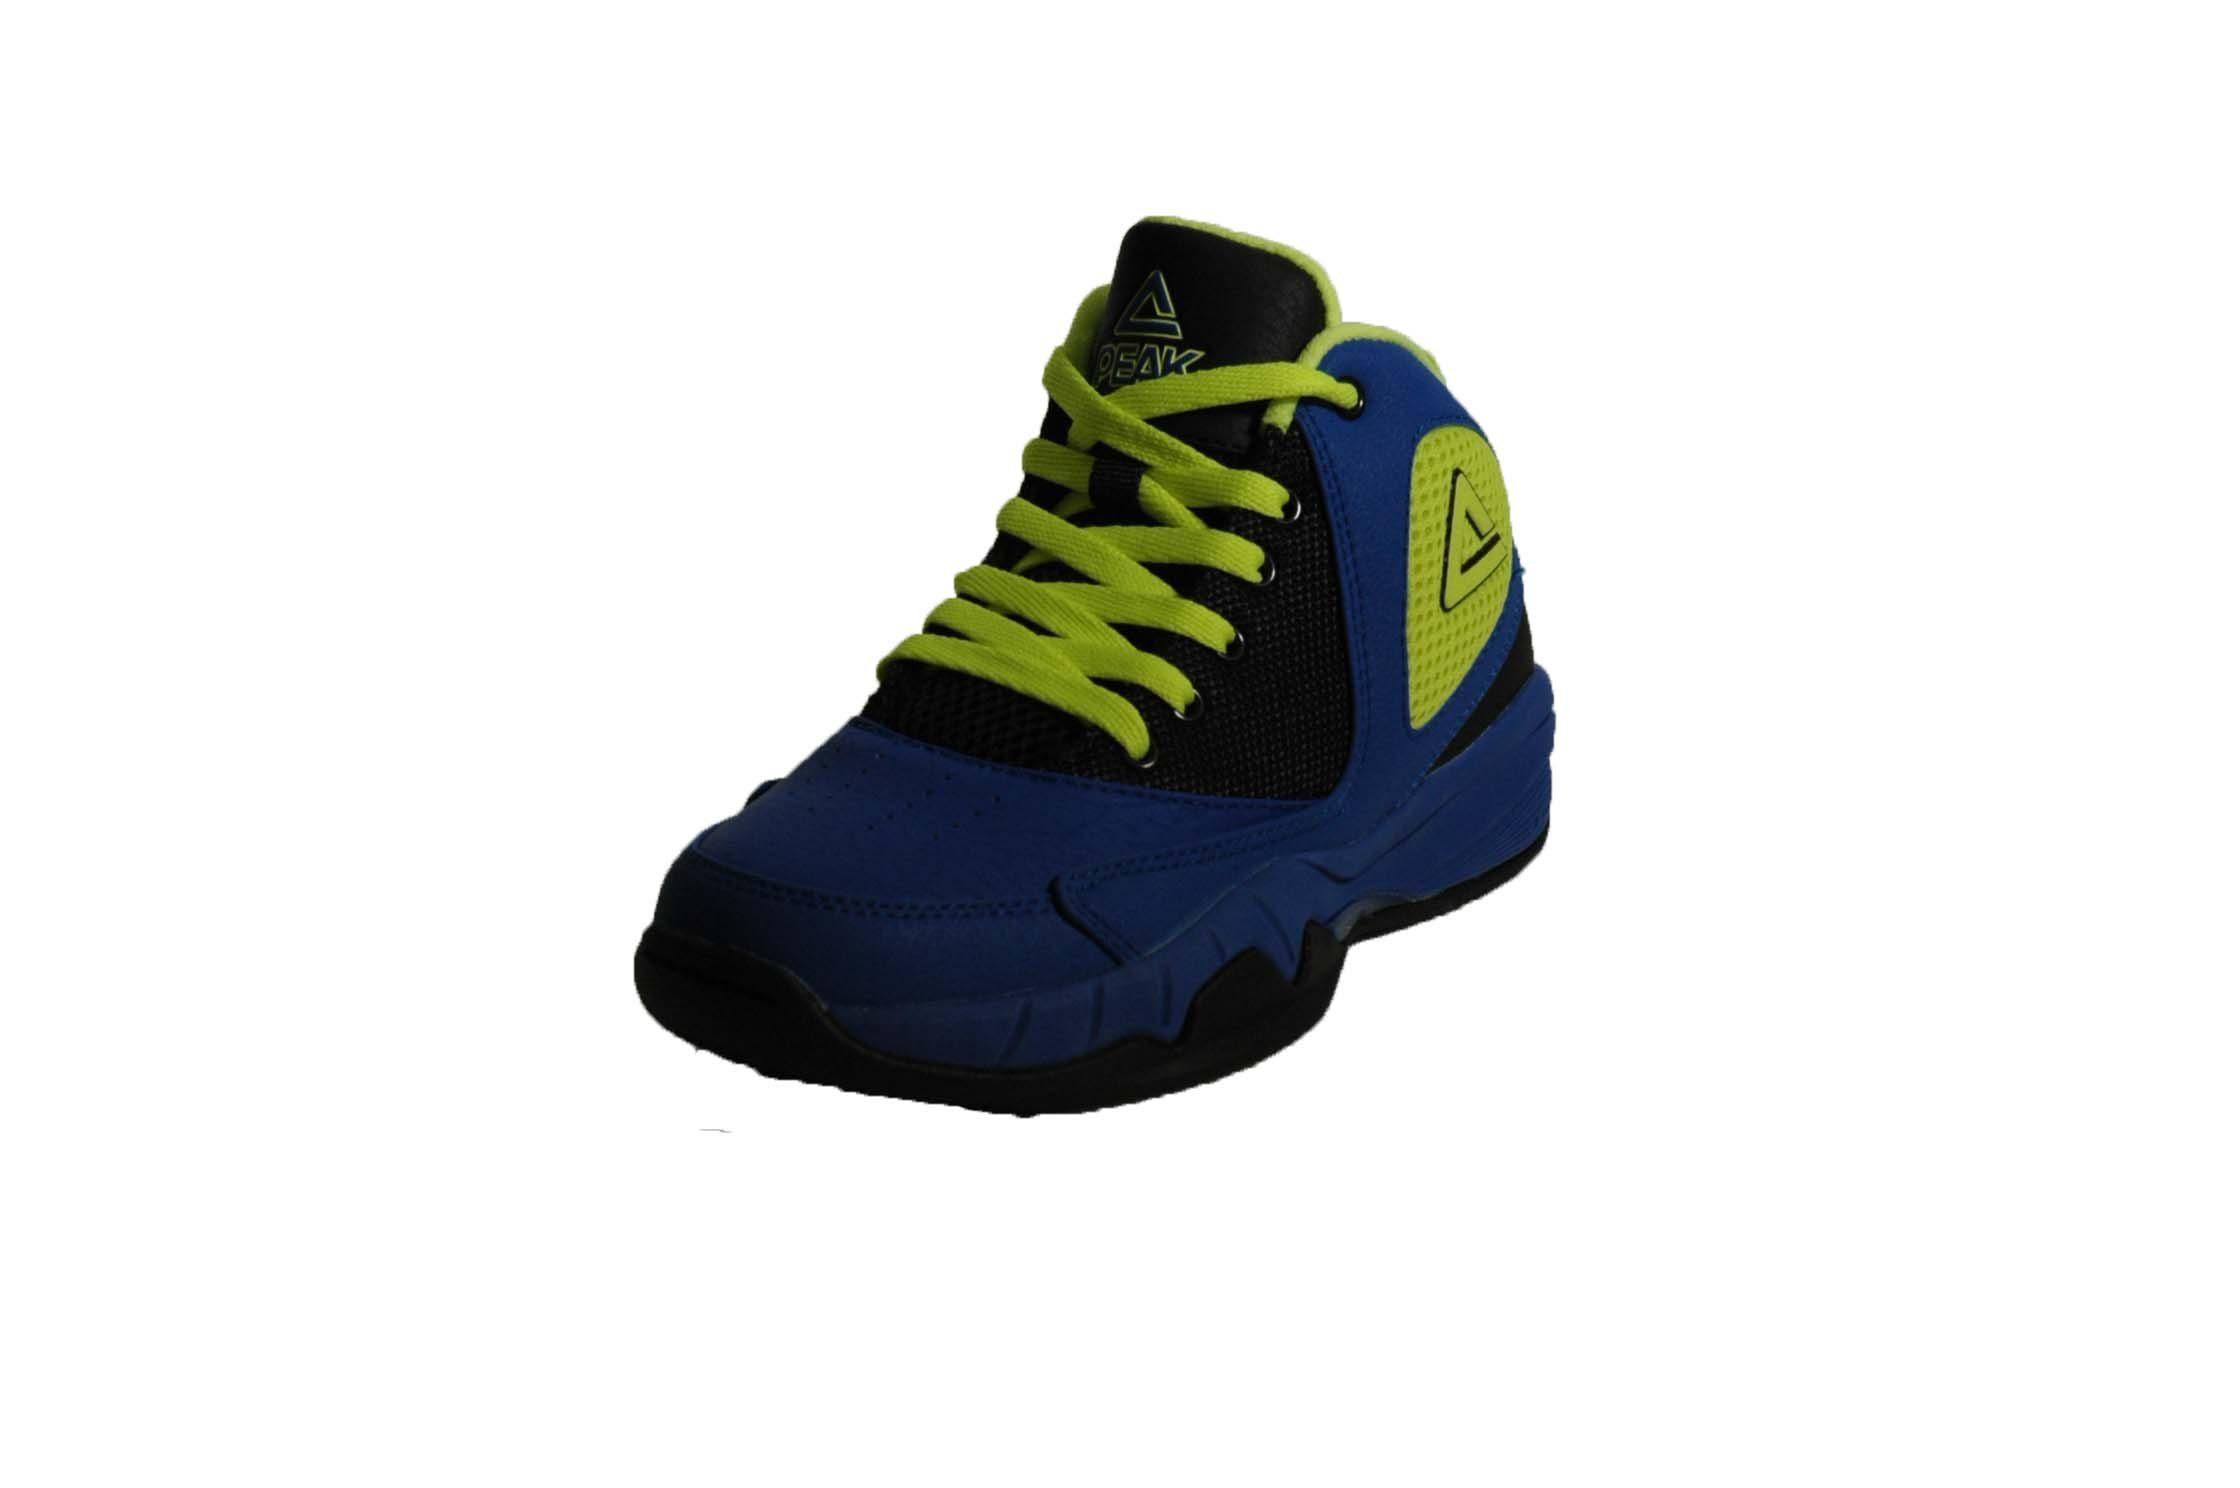 Unisex PEAK Trainingsschuh blau, gelb, grau, grün, rot, schwarz, silber, weiß   06901321607852